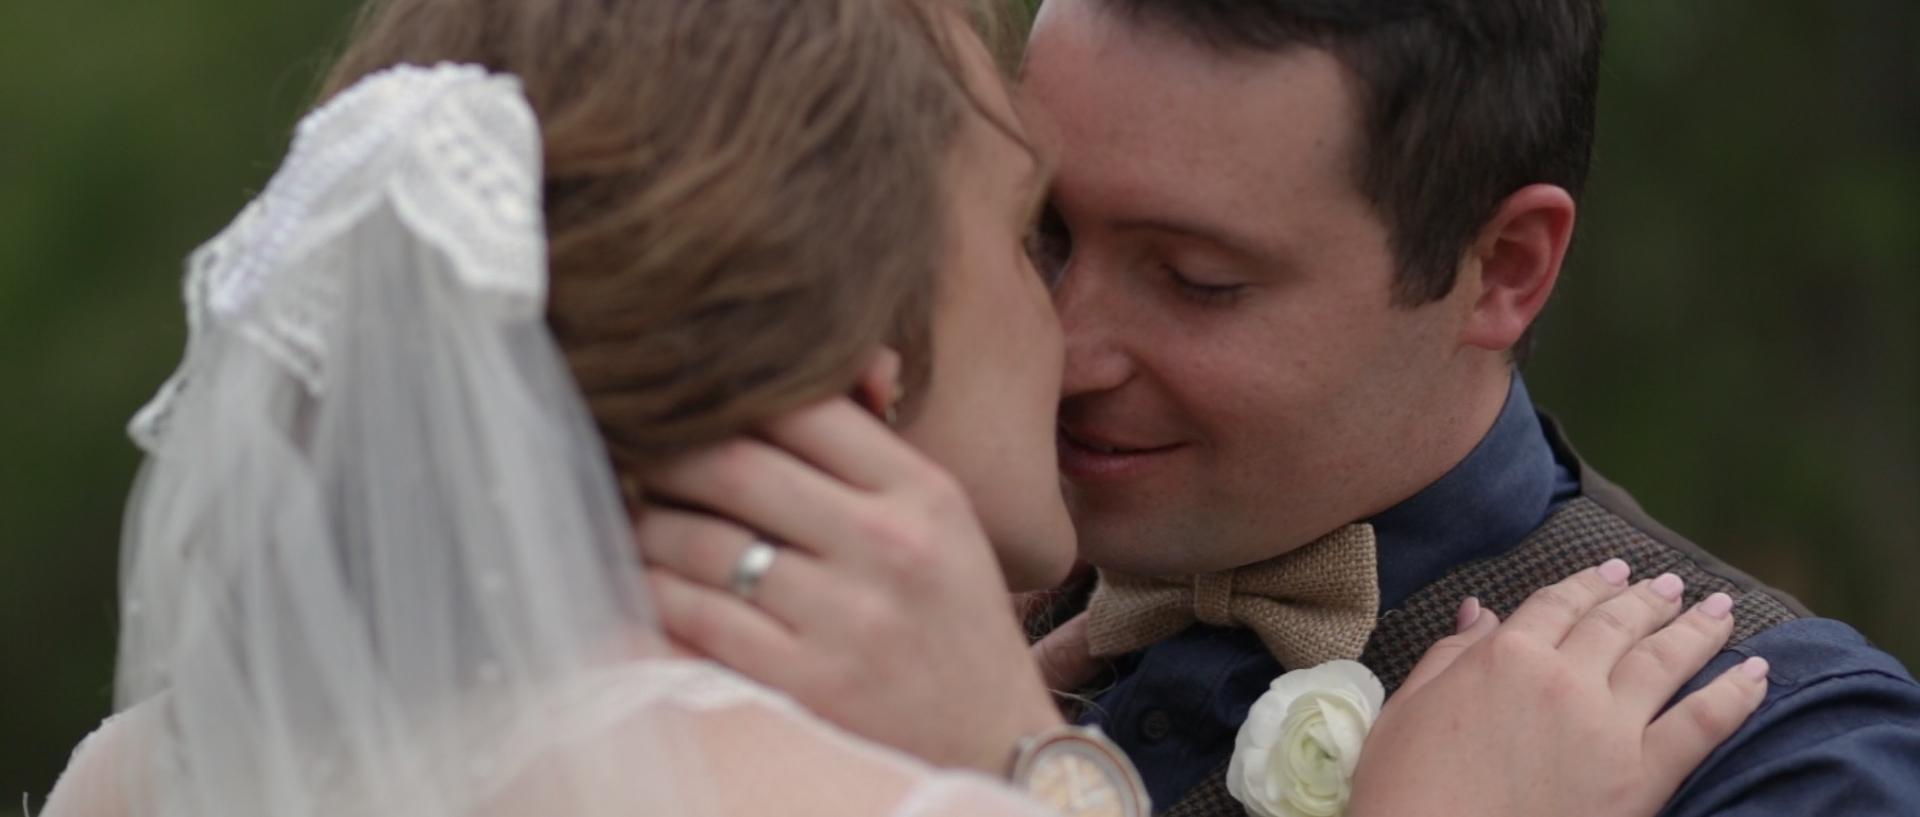 josee-corey-wedding-kiss-spring-wedding-amavi-films-wedding-videographer.jpg